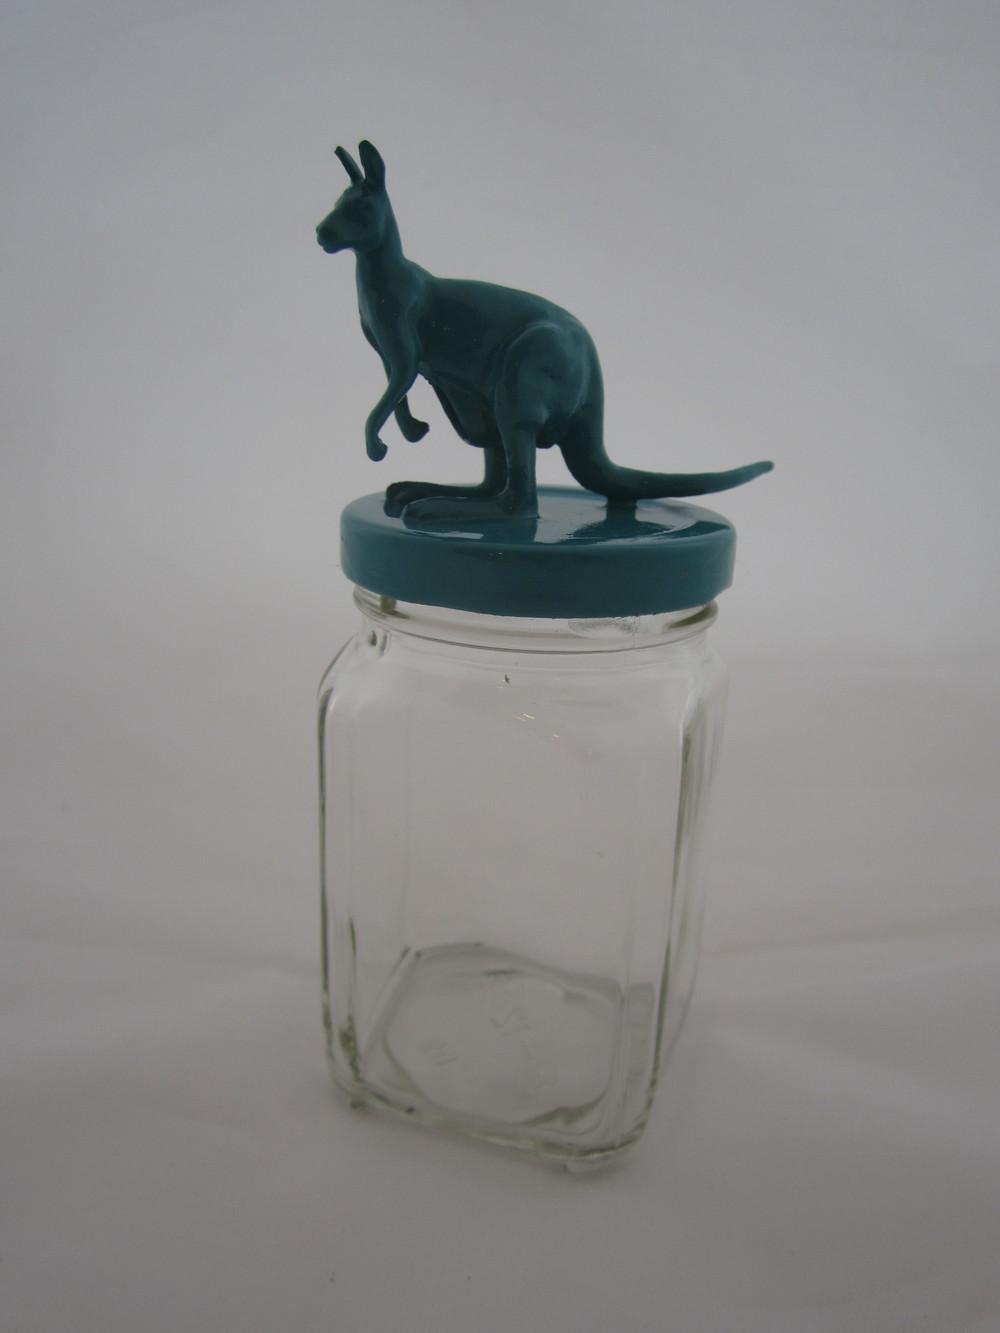 Teal Kangaroo Jar 1.JPG